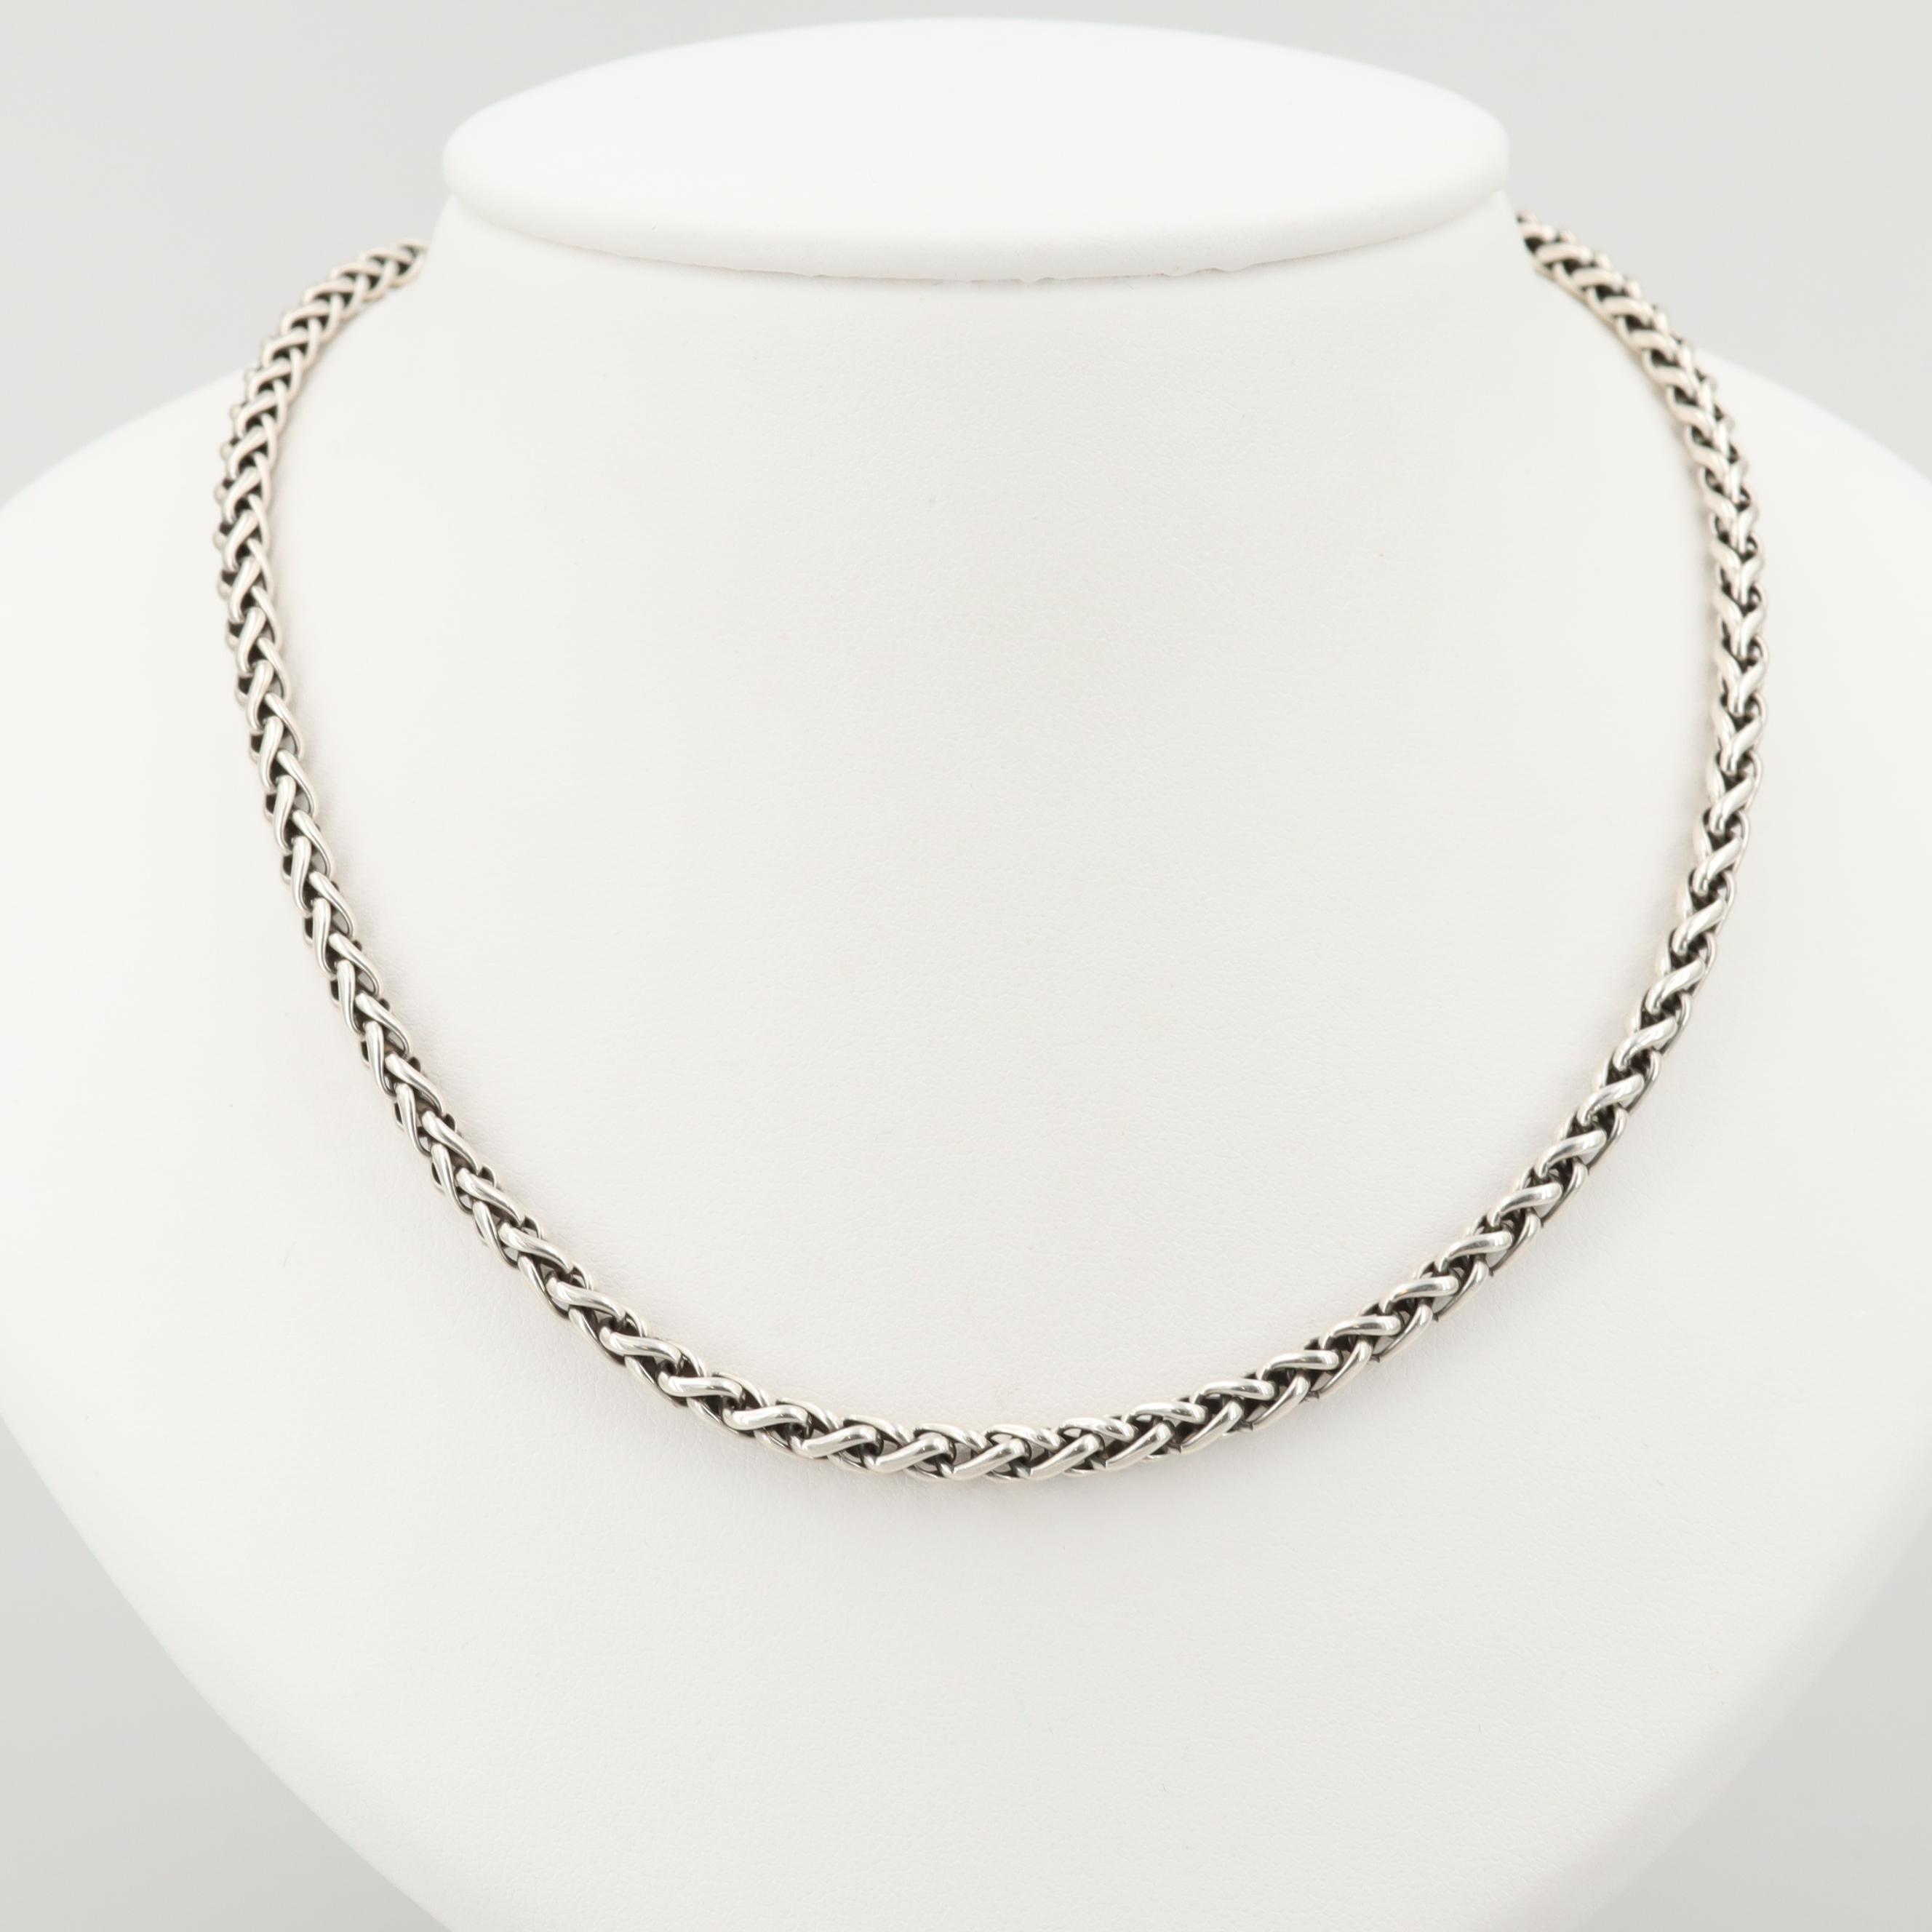 David Yurman Sterling Silver Wheat Chain Necklace